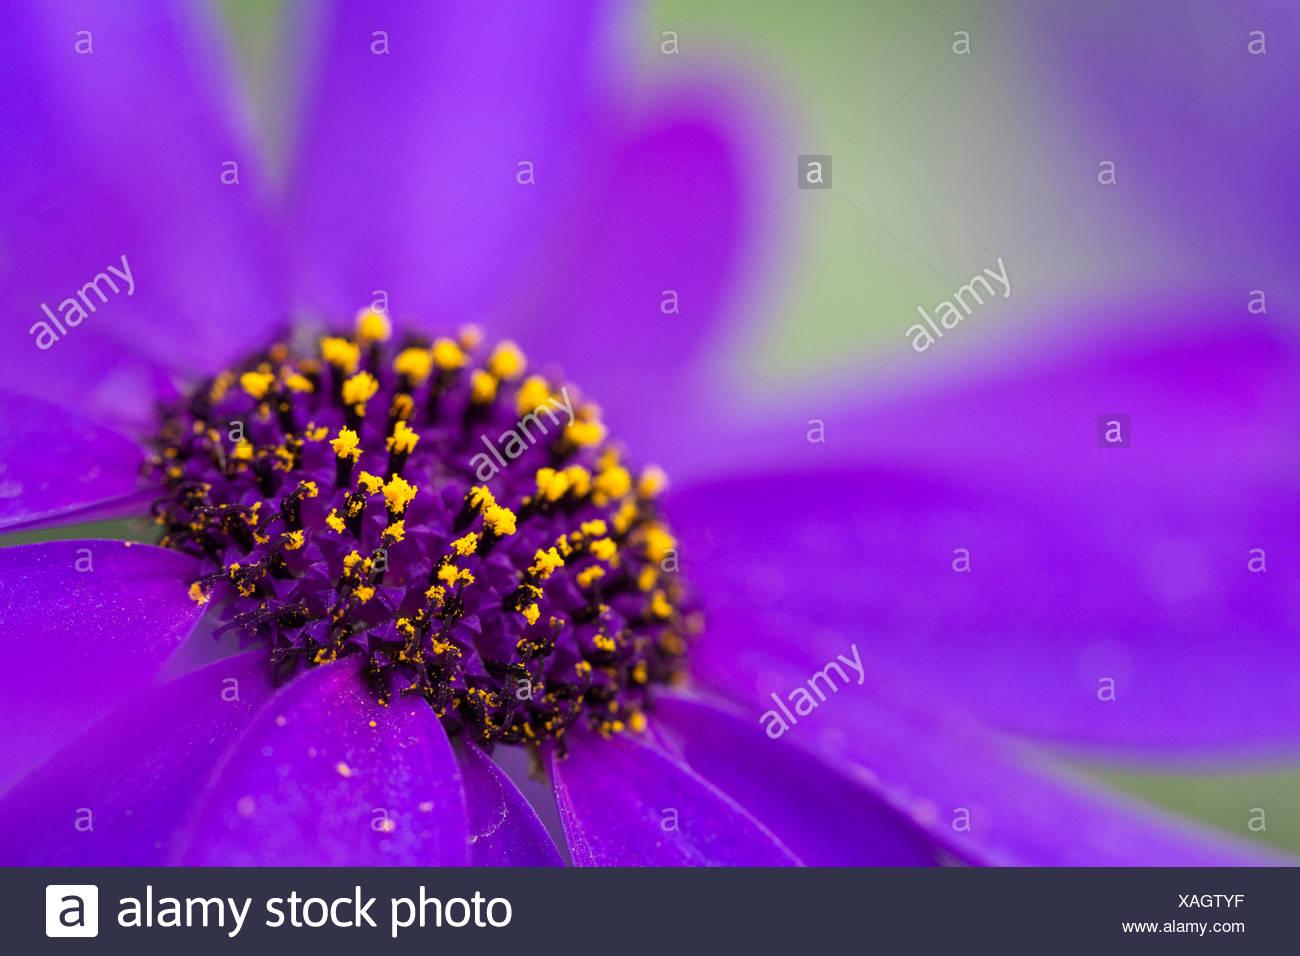 Cineraria (Pericallis x hybrida Senetti Deep Blue), detail of a flower - Stock Image